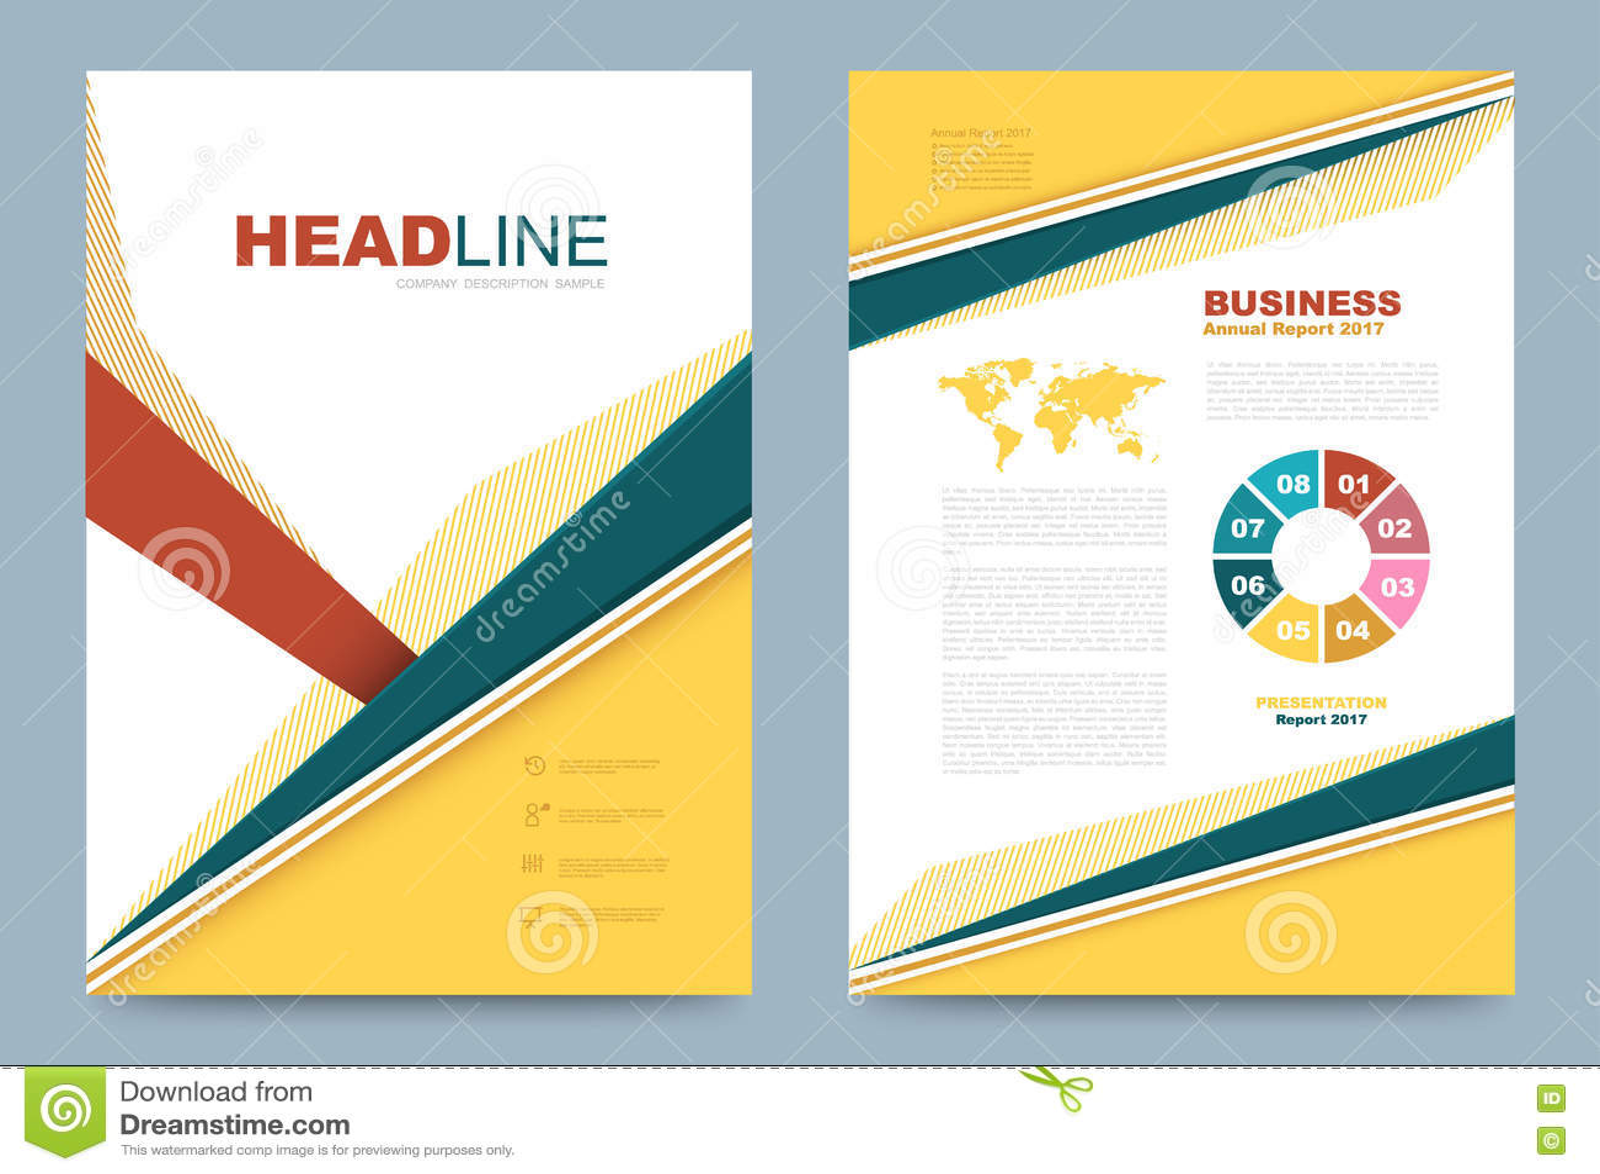 printing press brochure template - template design stock vector image 74353631